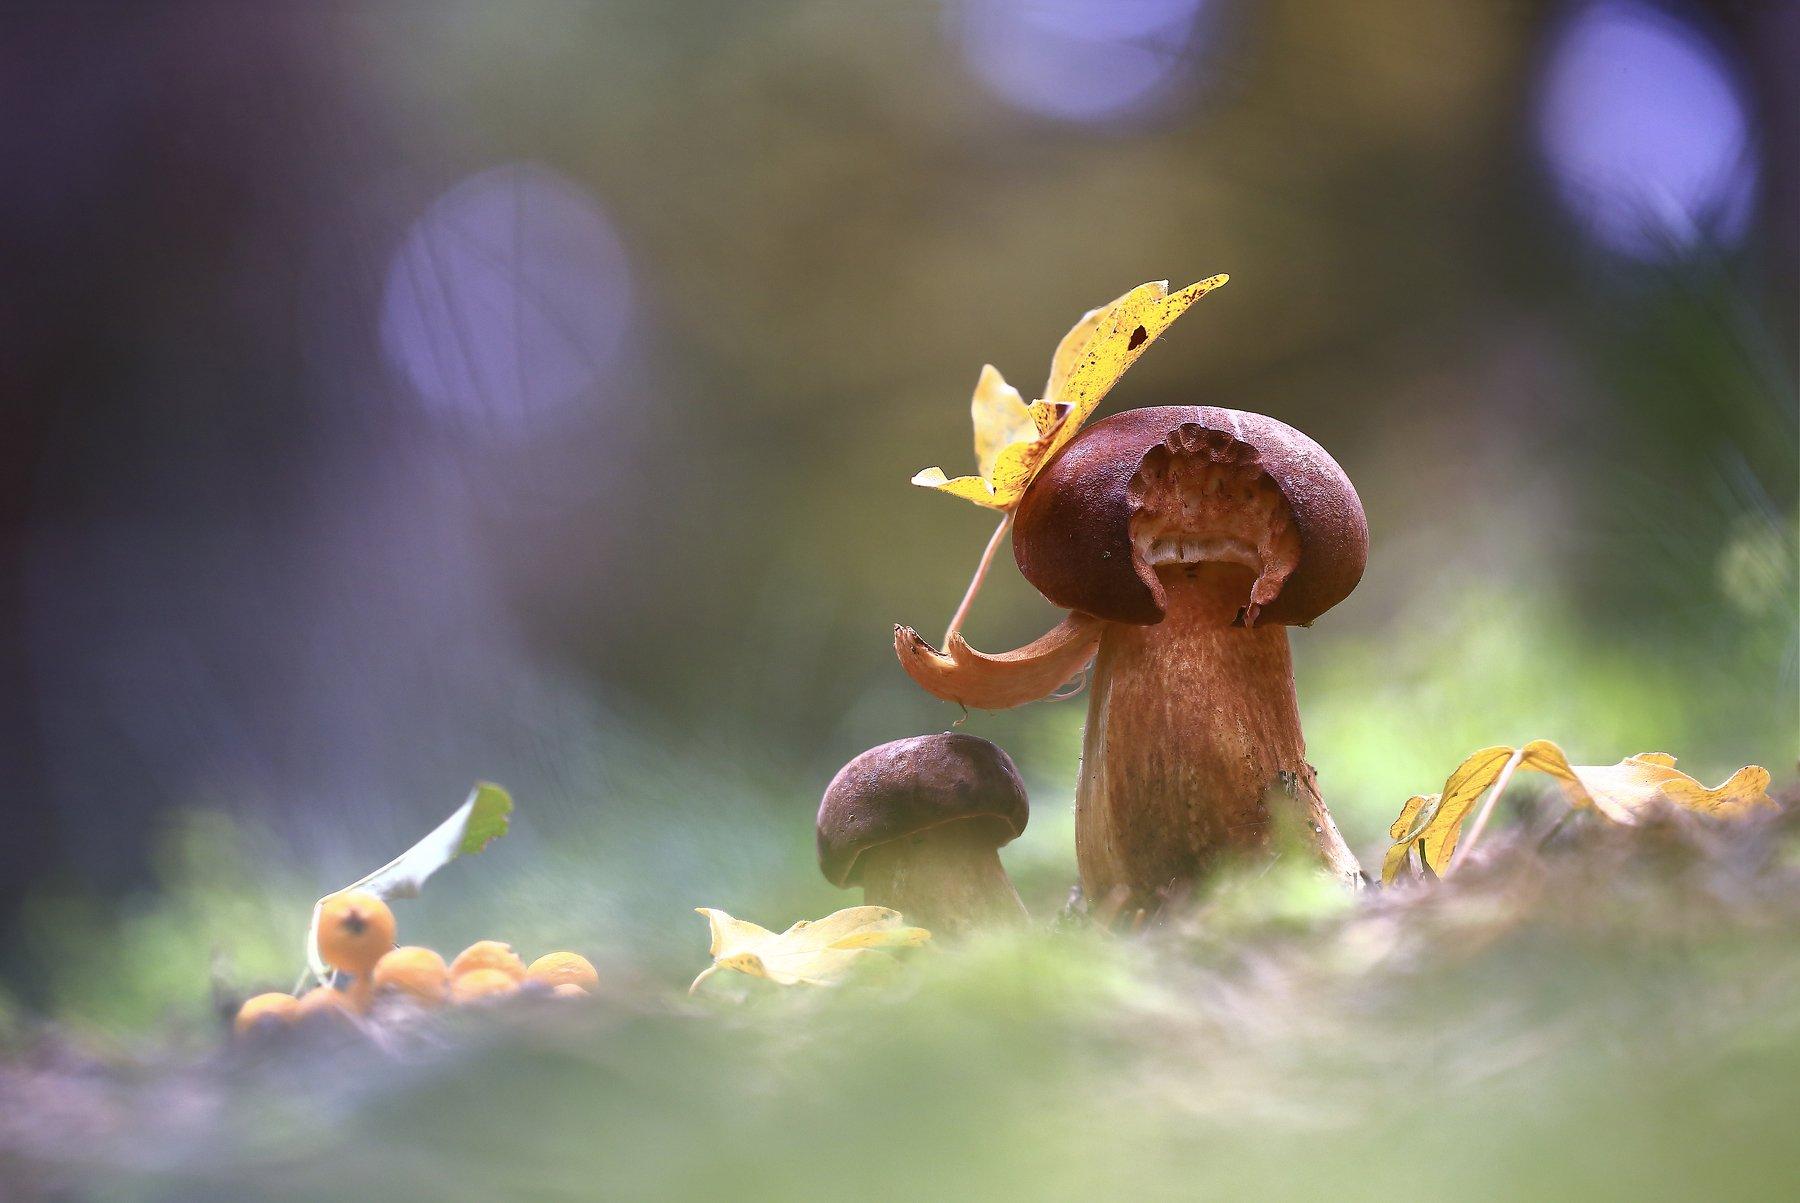 Гриб.лес.осень.лист., Viktor Schneider